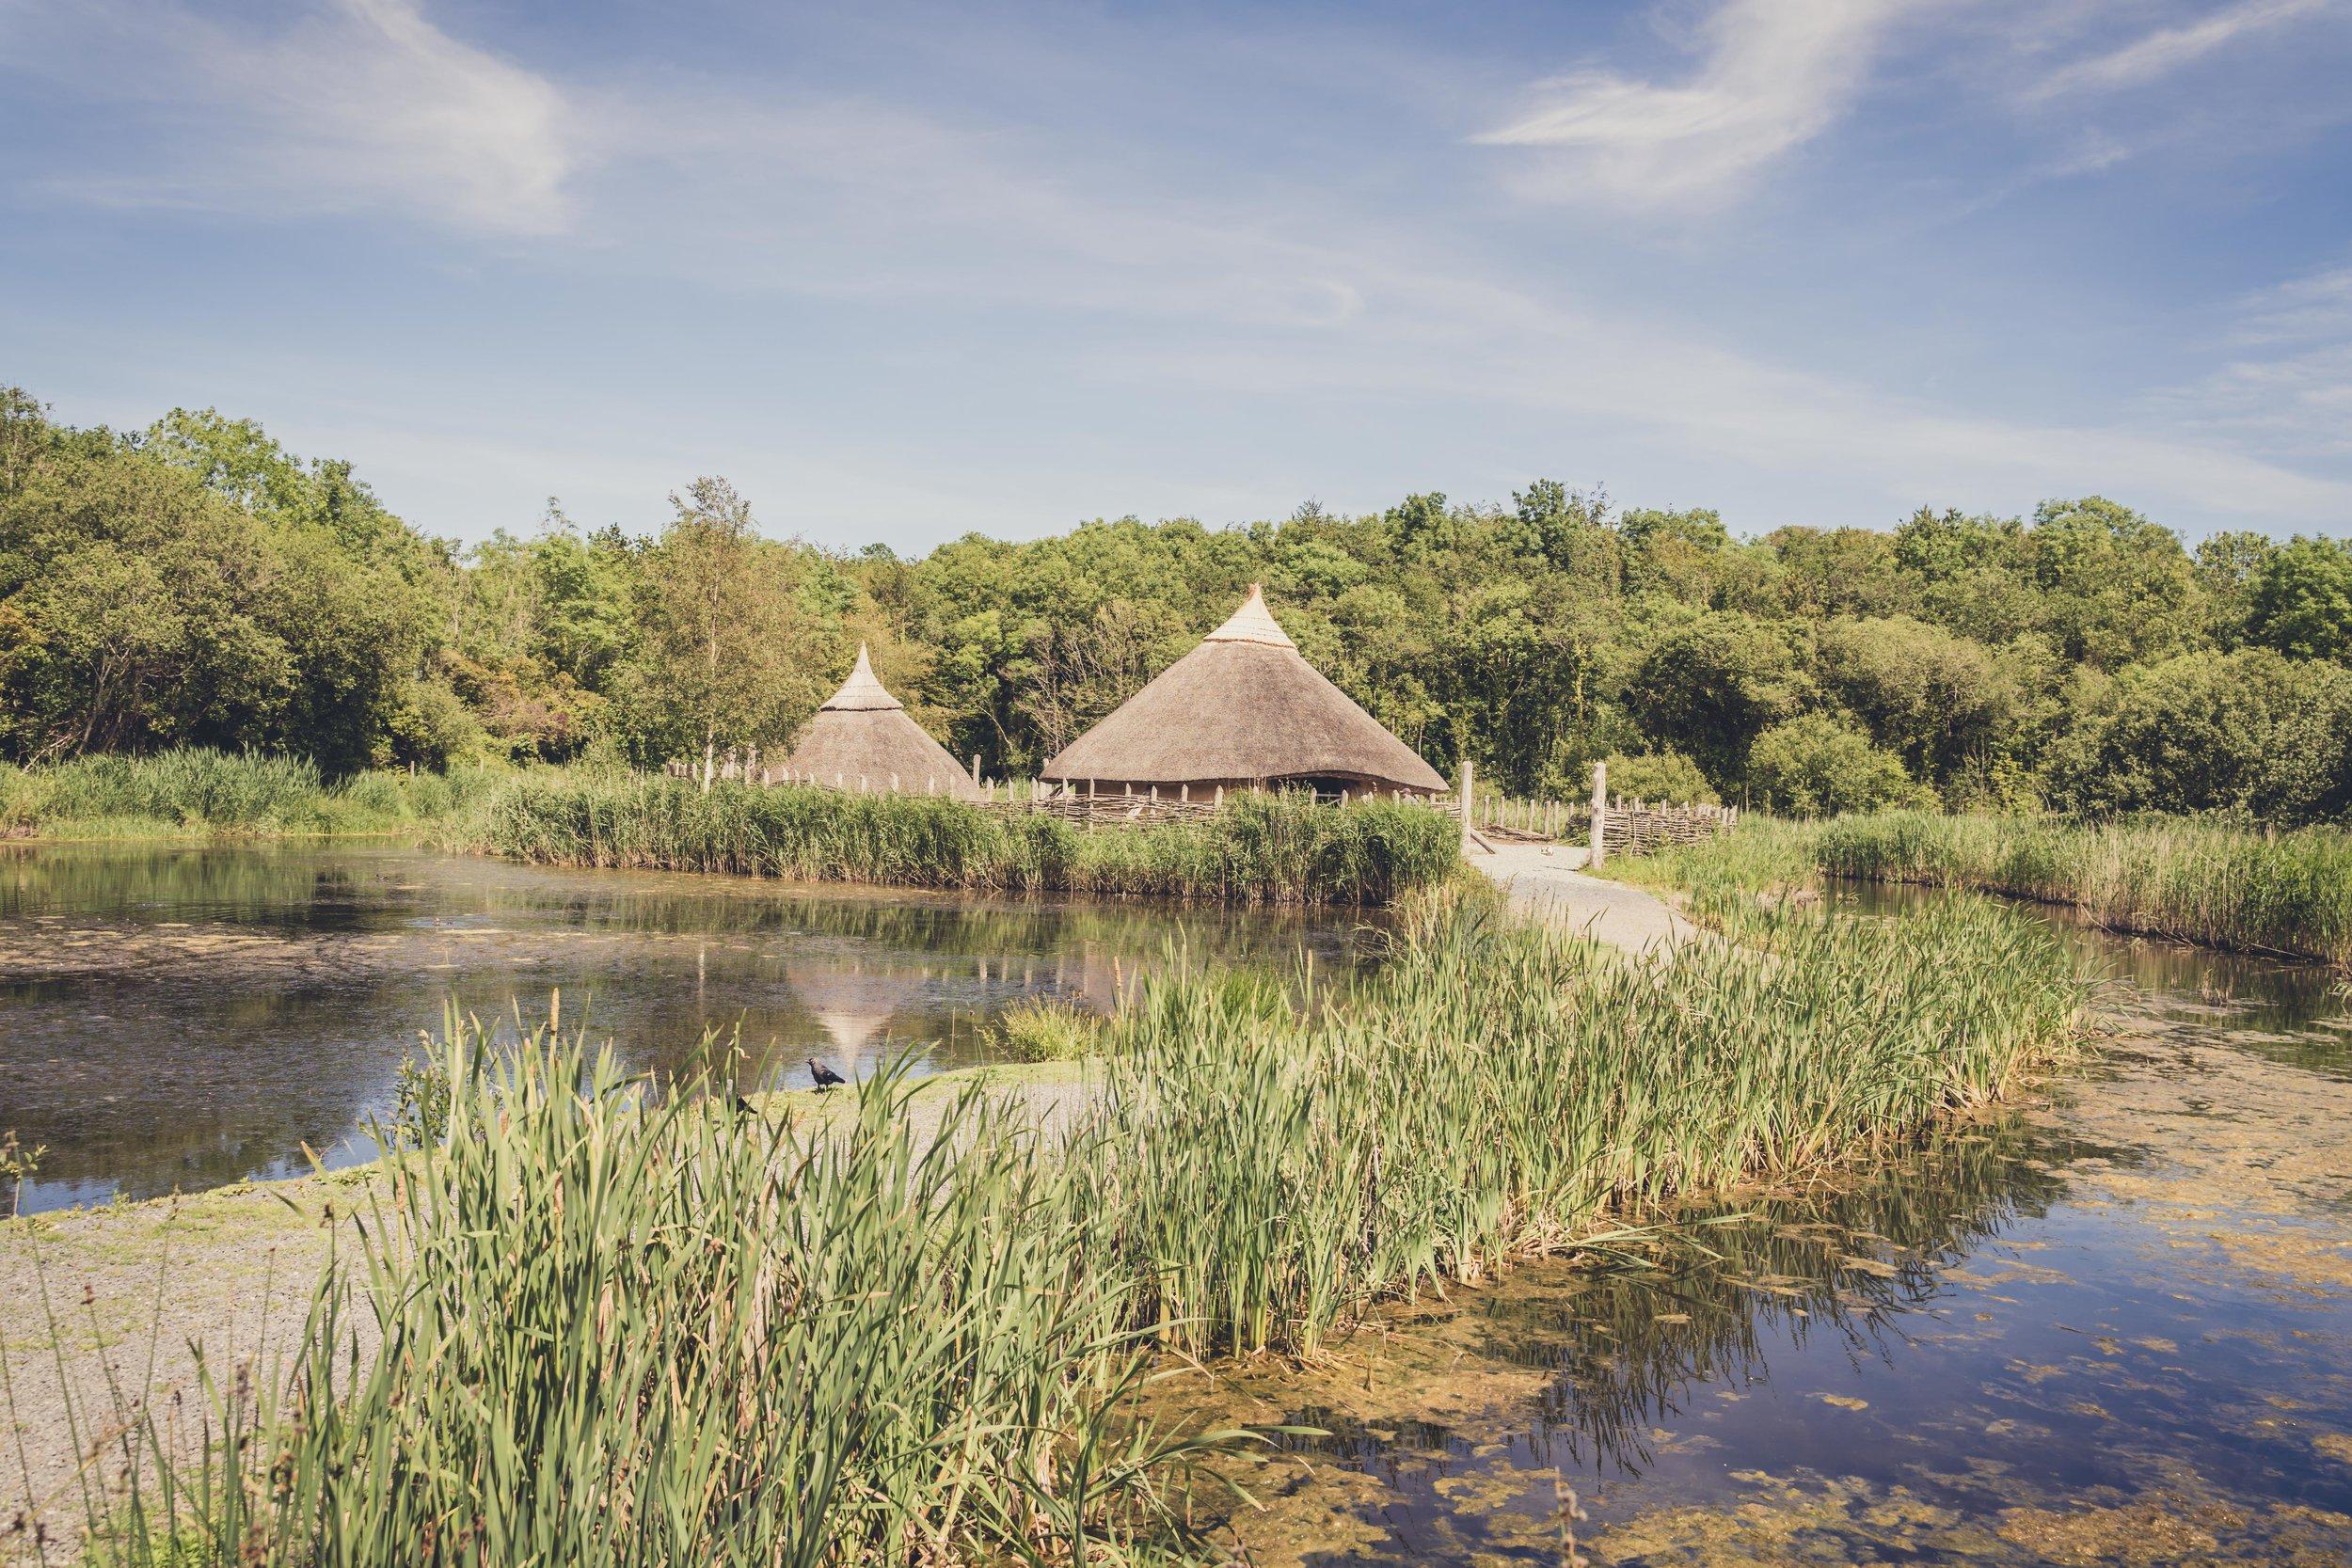 wexford heritage centre ireland crannog.jpg